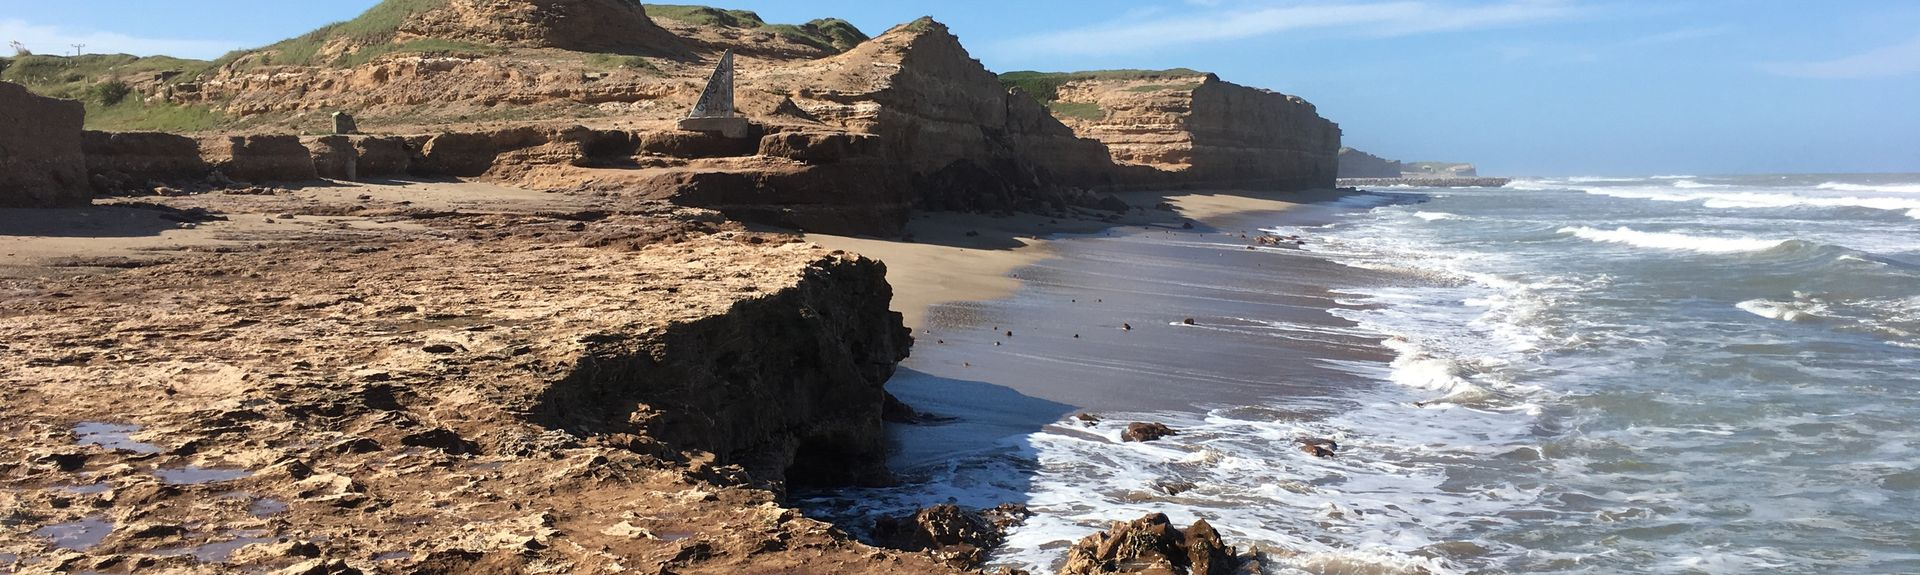 Punta Mogotes Beach, Mar del Plata, Buenos Aires (province), Argentina